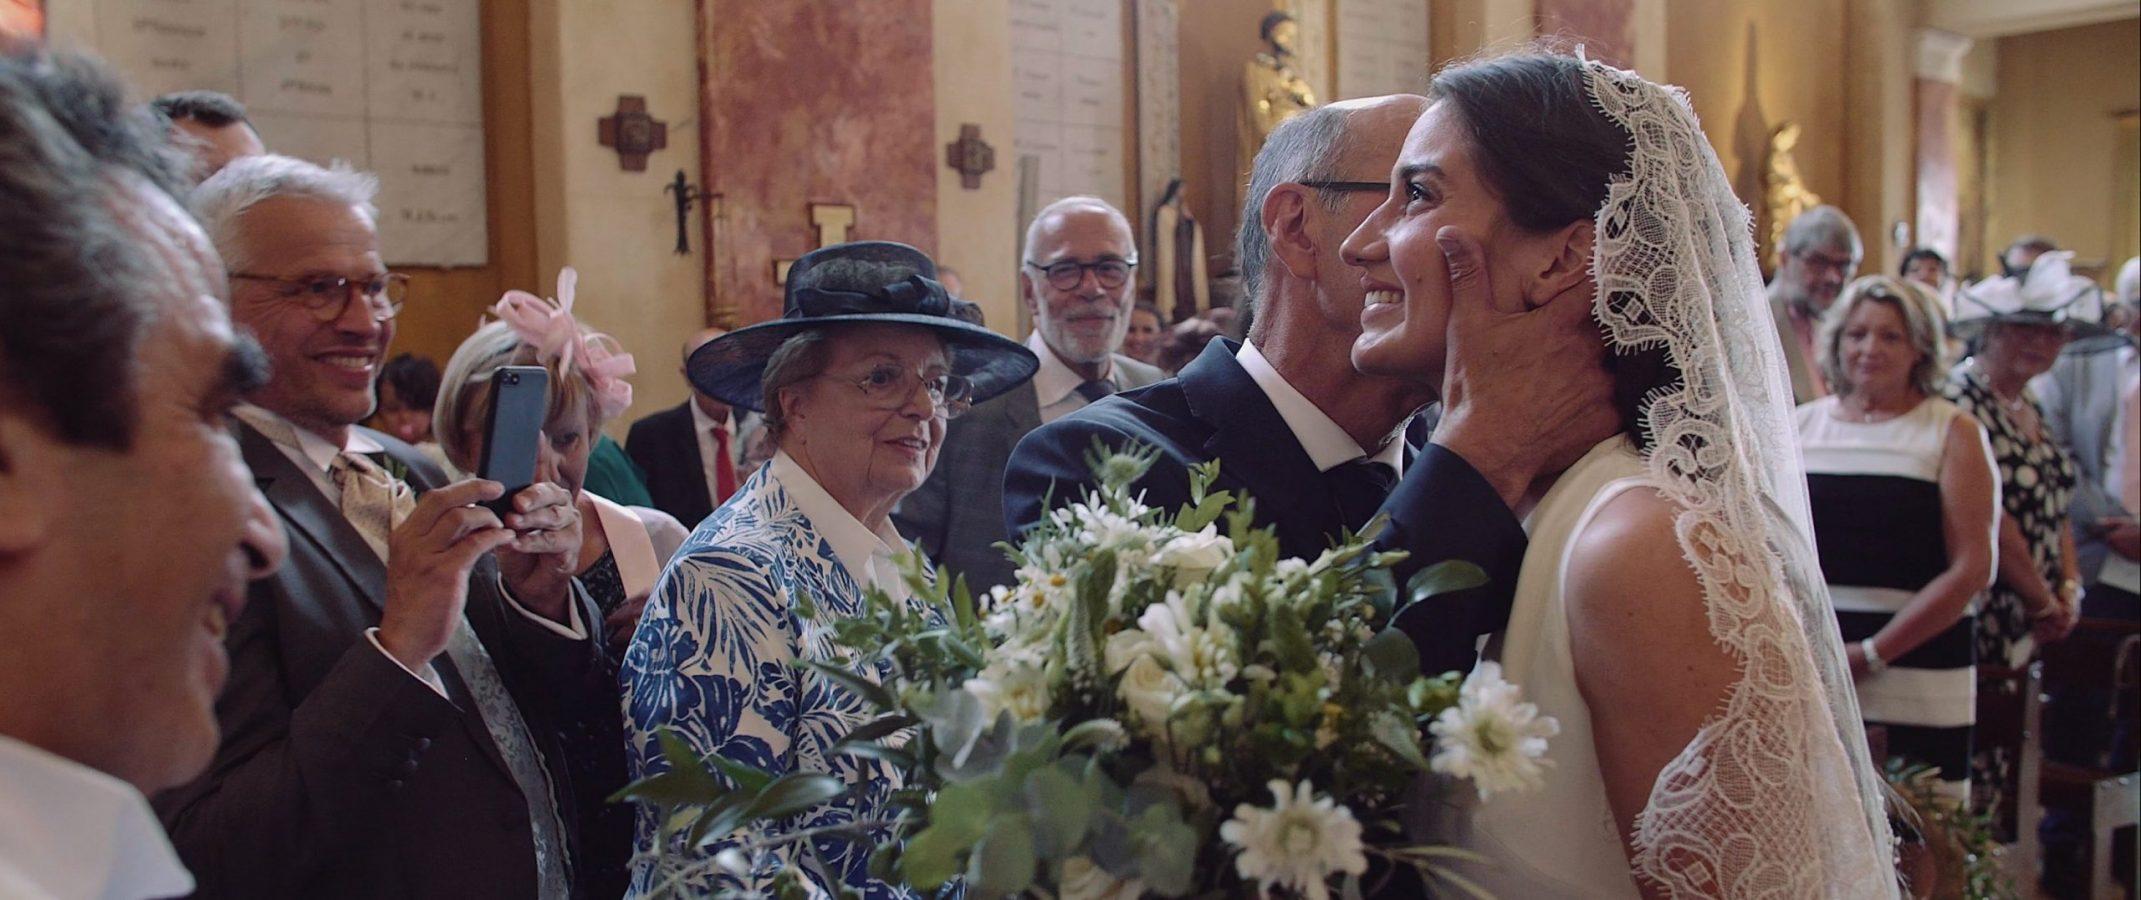 mariage Chateau de Grimaldi 2